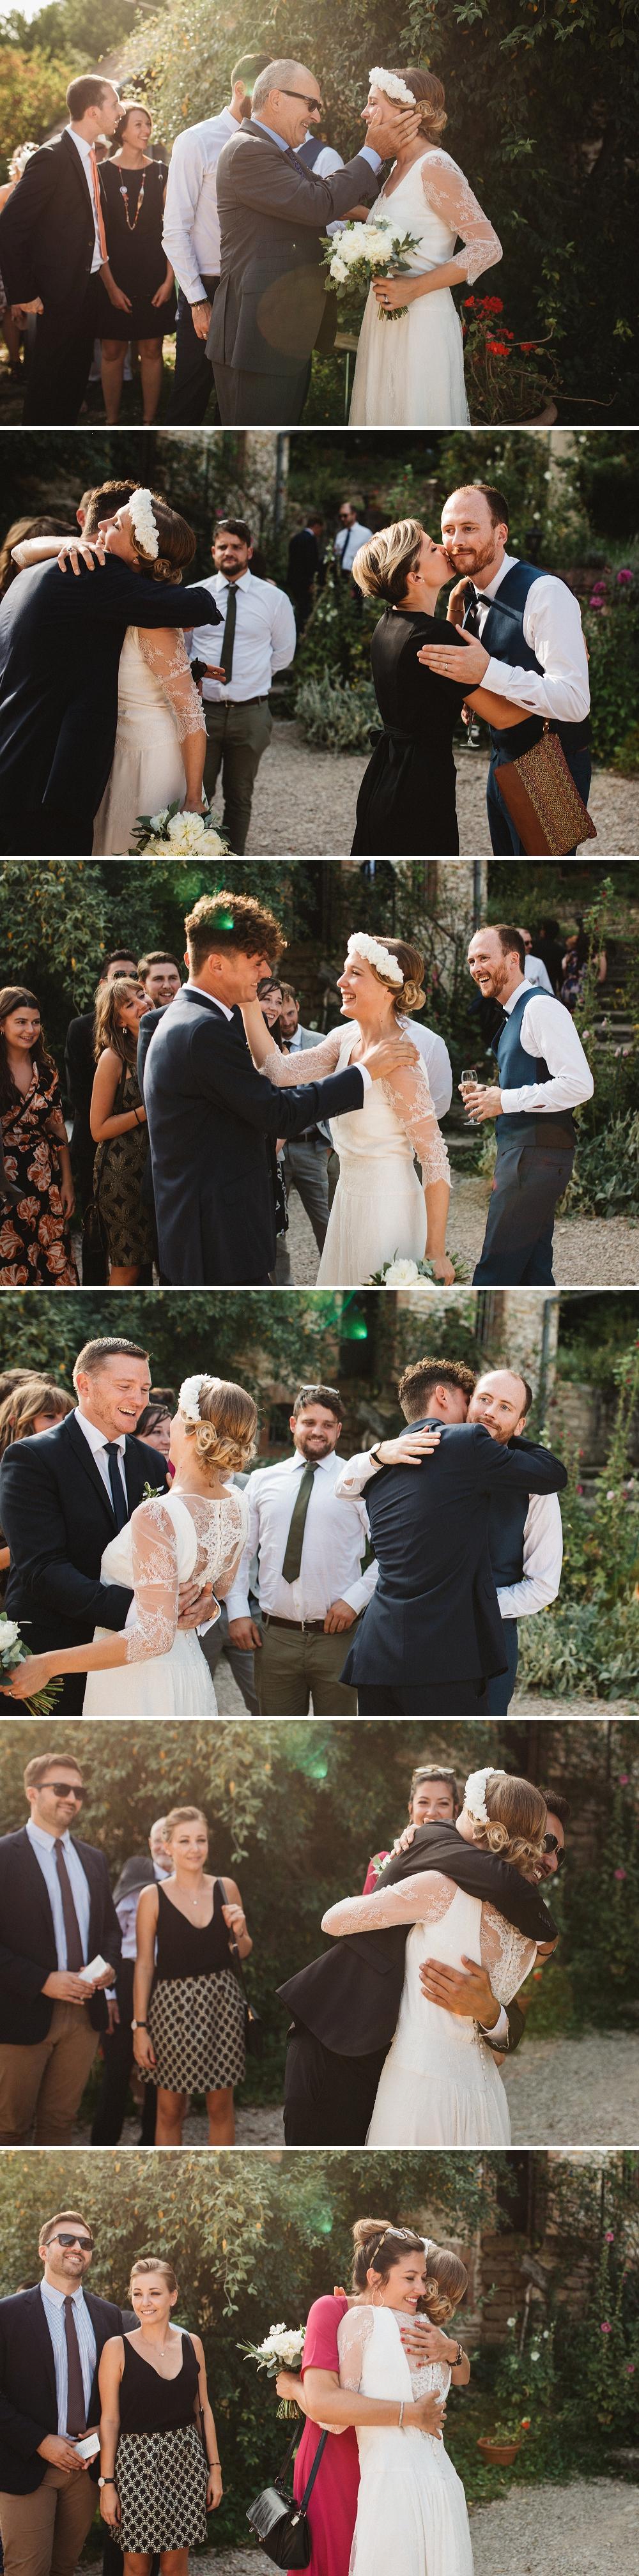 mariage-morimont-27.jpg